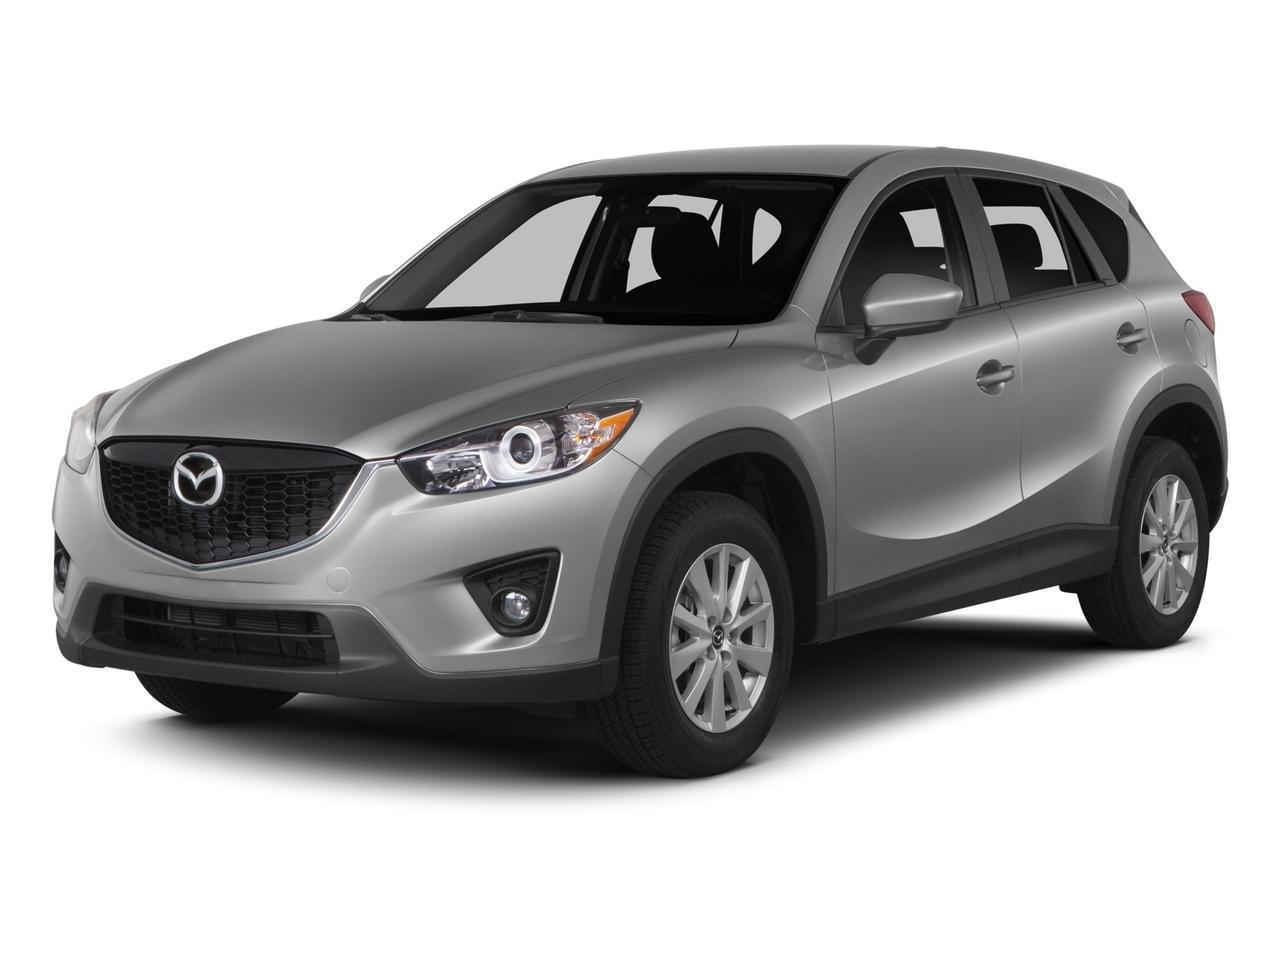 2015 Mazda CX-5 Vehicle Photo in Midland, TX 79703